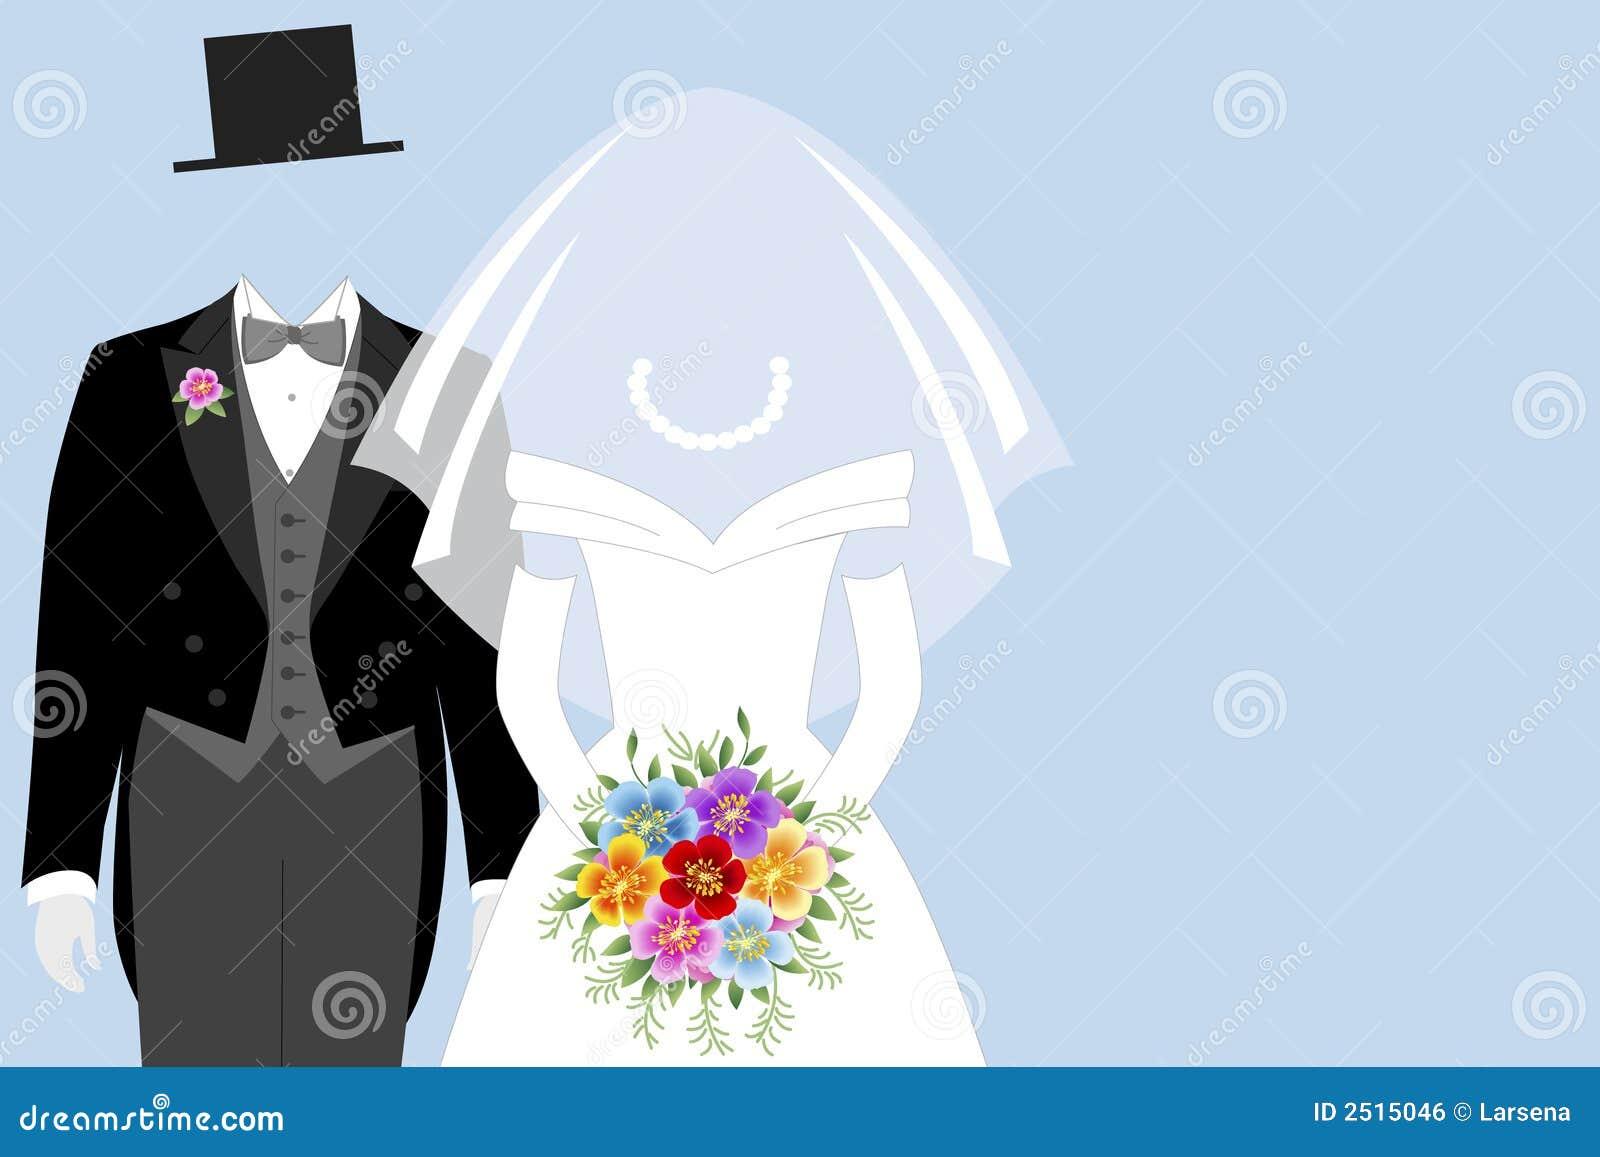 Busco Novio - Buscar pareja gratis a travs de internet